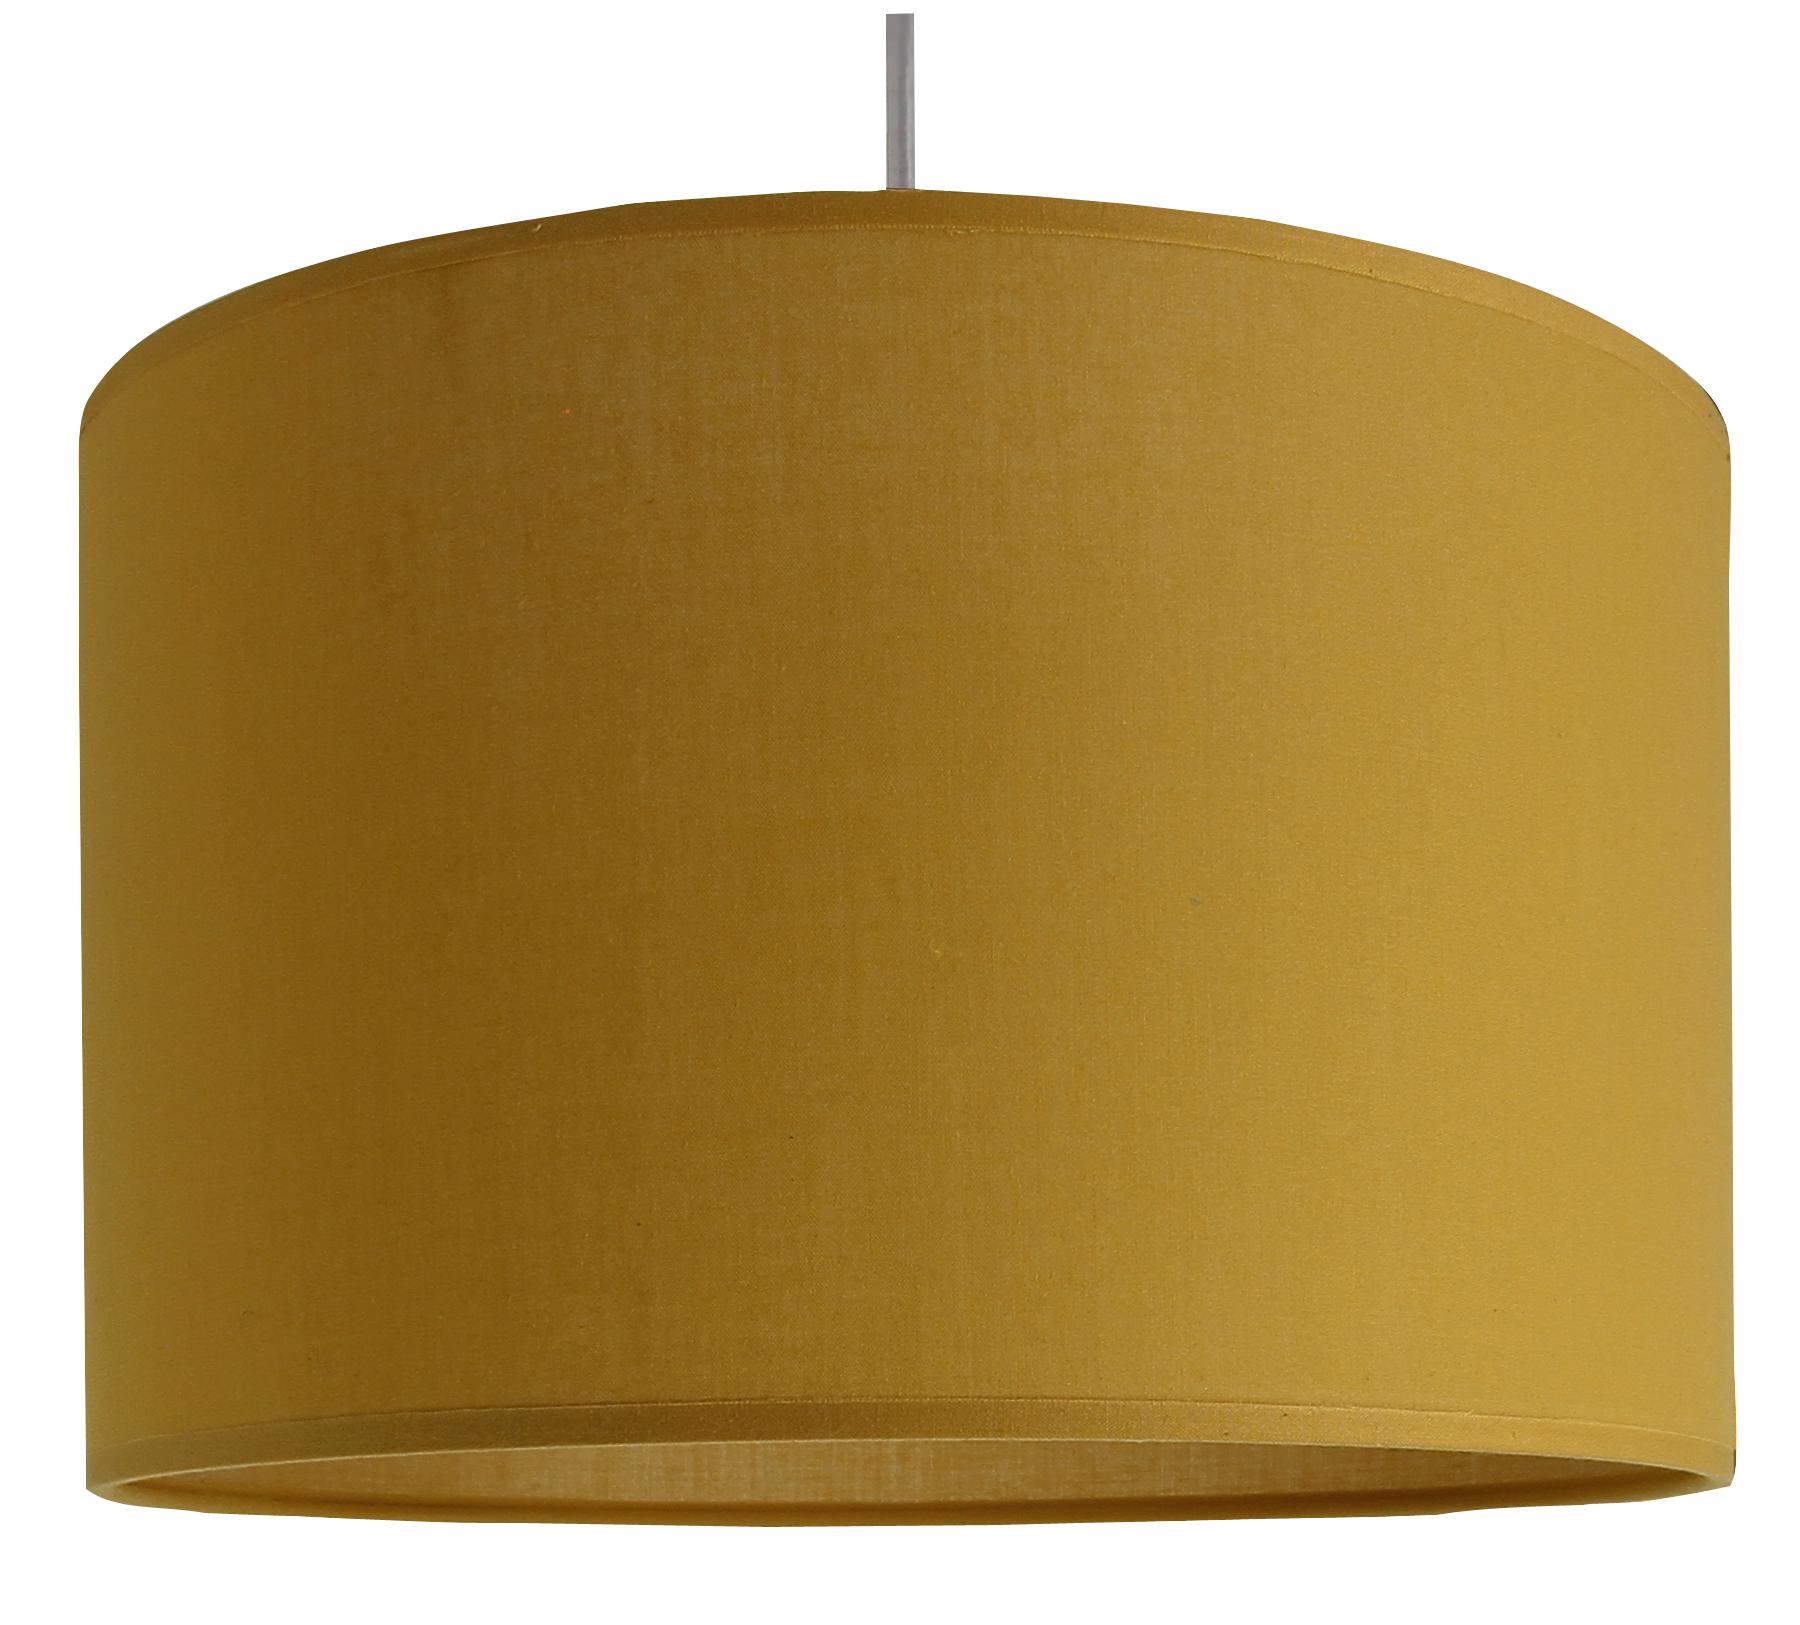 Suspension cylindre jaune moutarde D29 cm